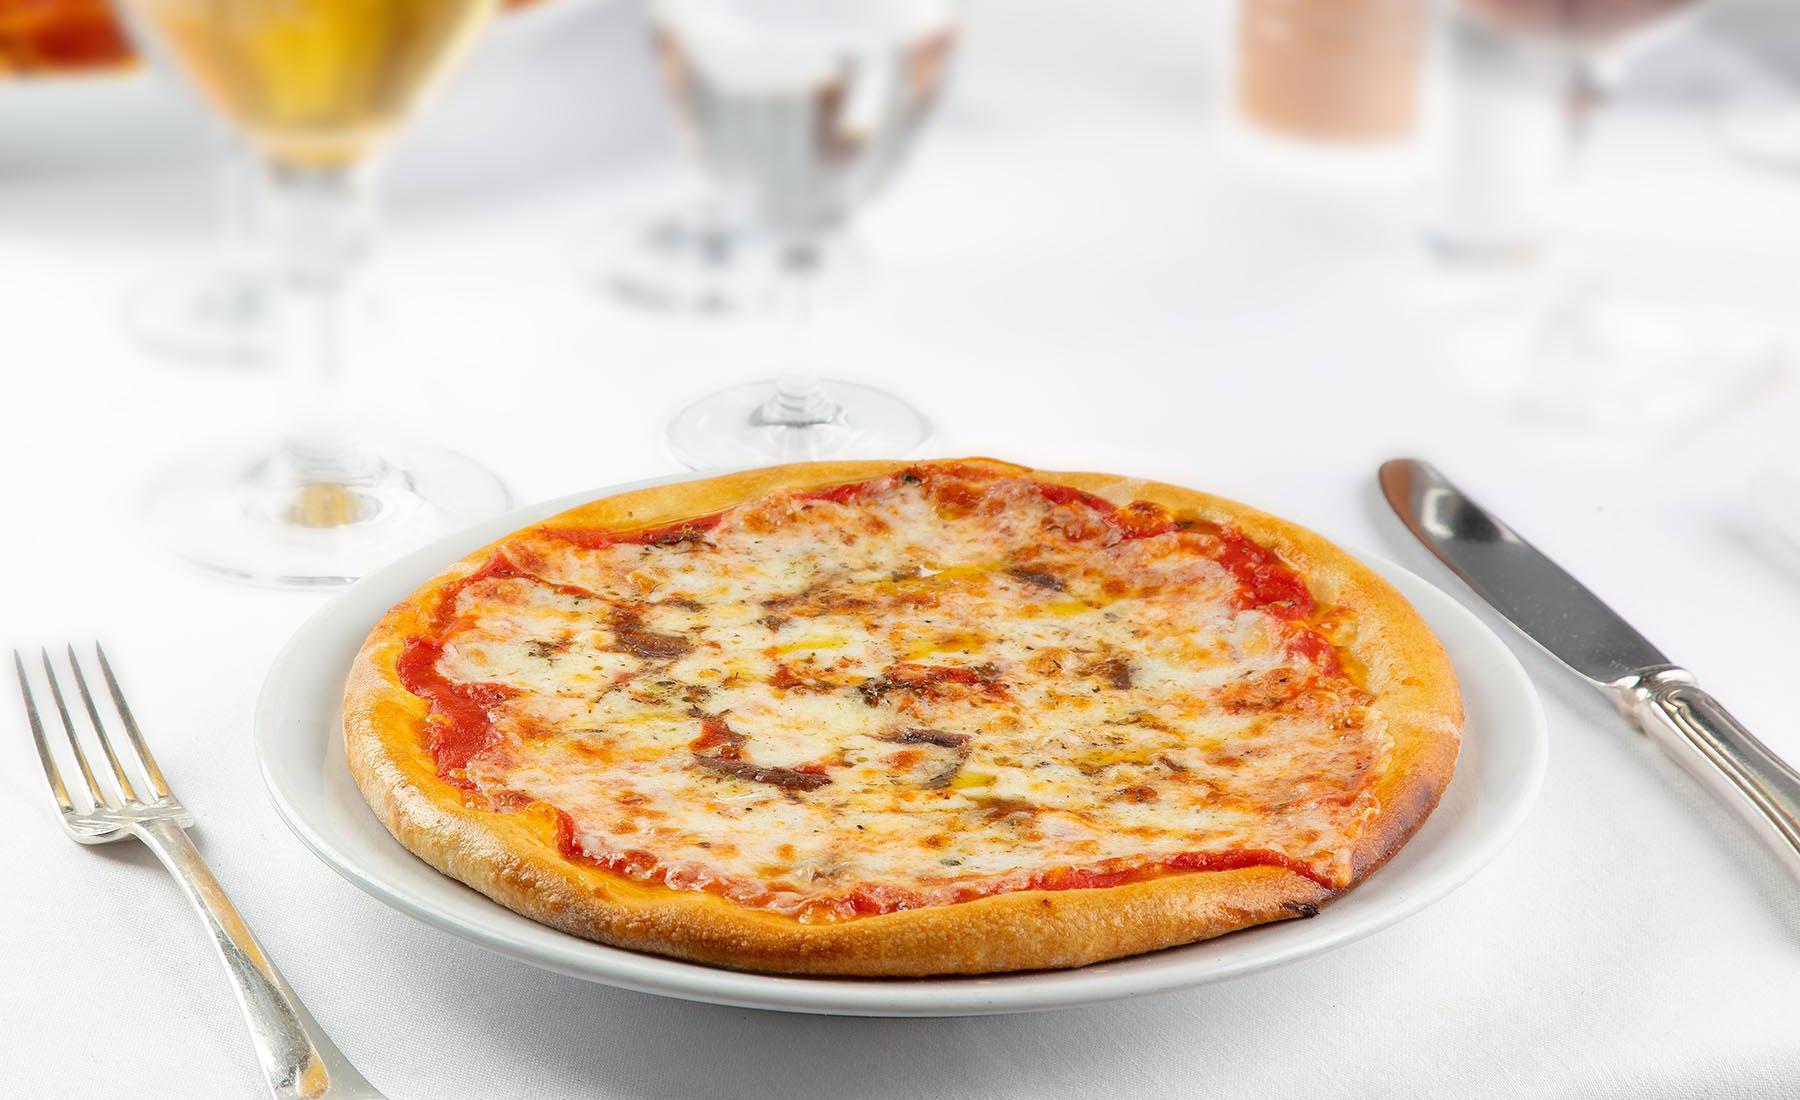 Pizza alla napoletana